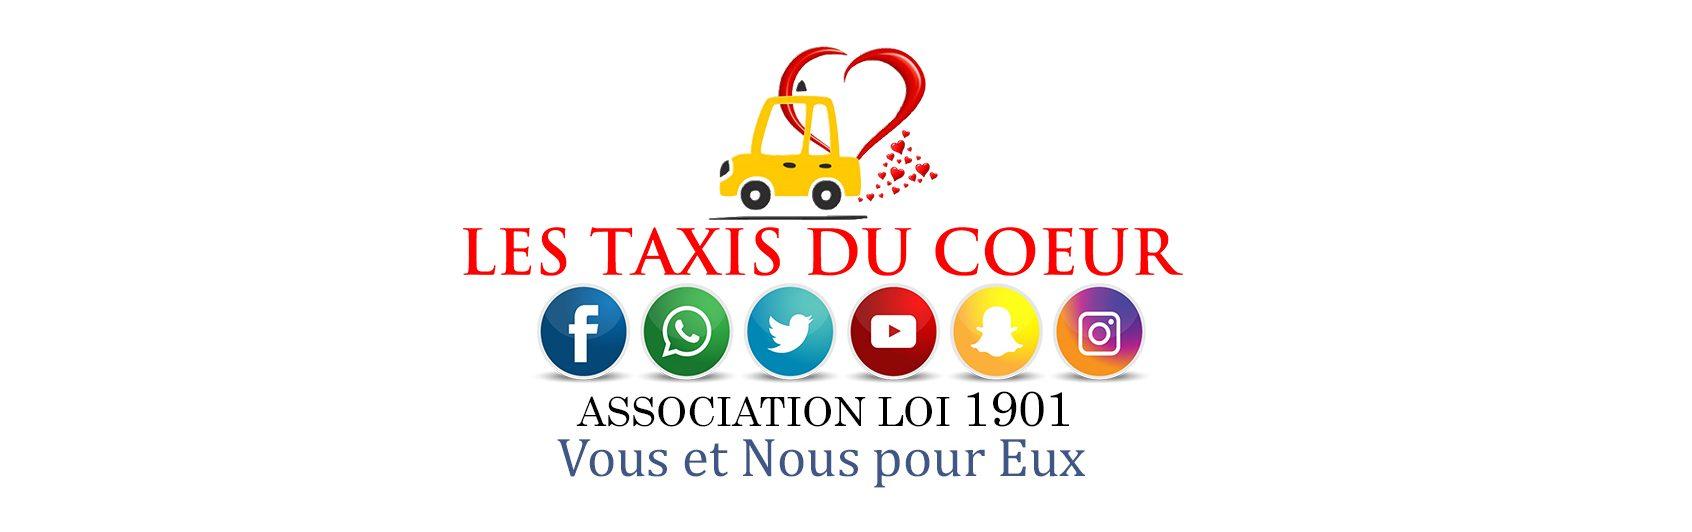 Les Taxis Du Coeur